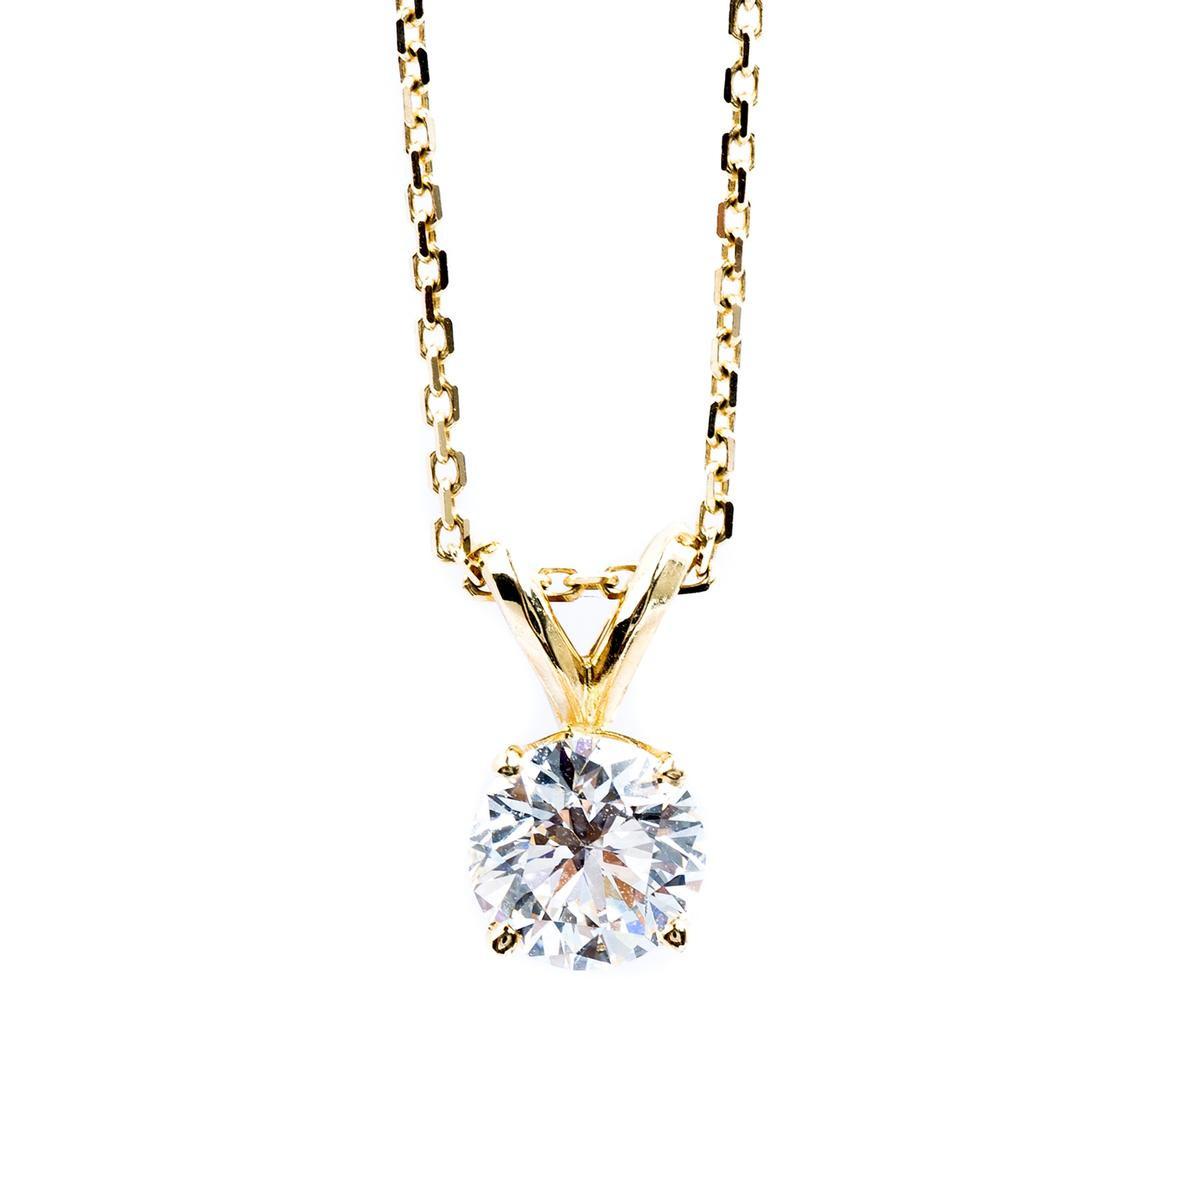 Vintage 0.71 Carat Diamond Pendant